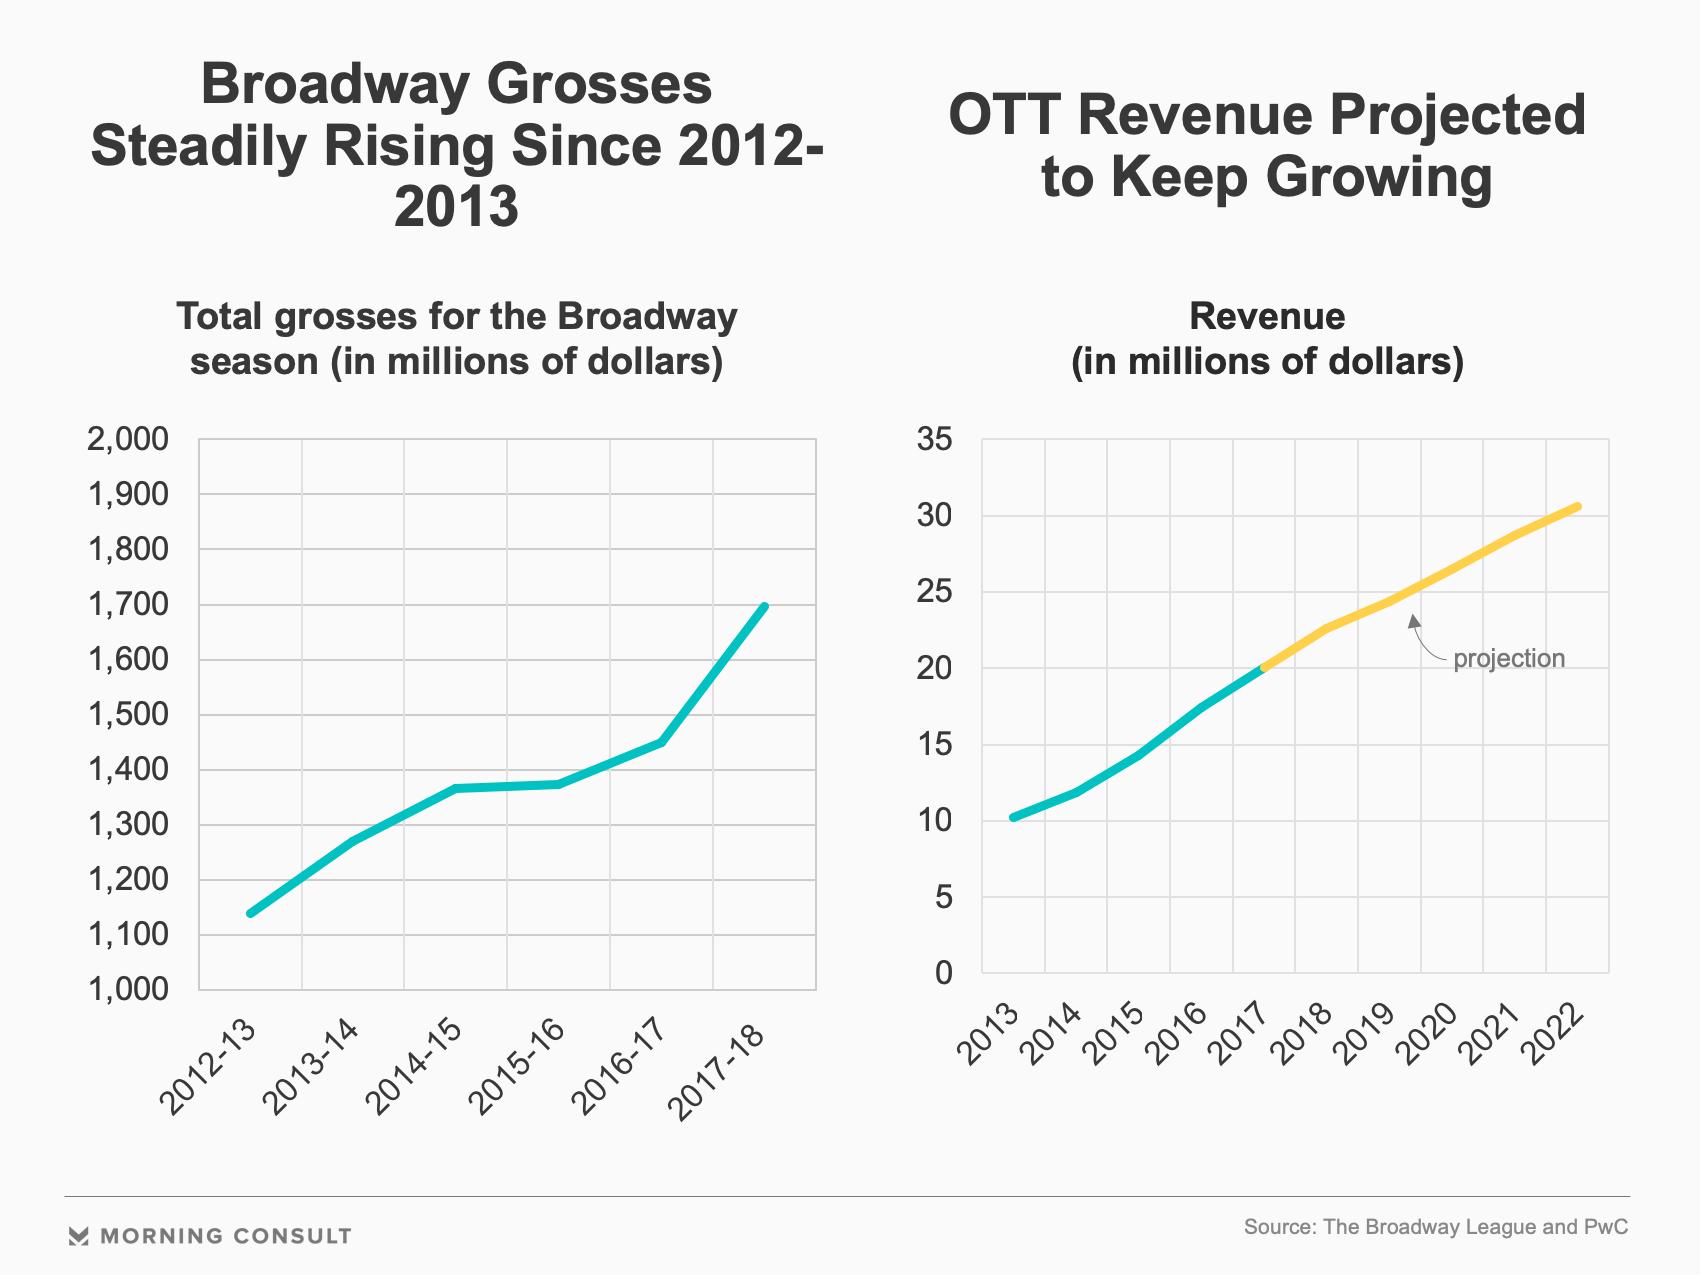 OTT Revenue Streams